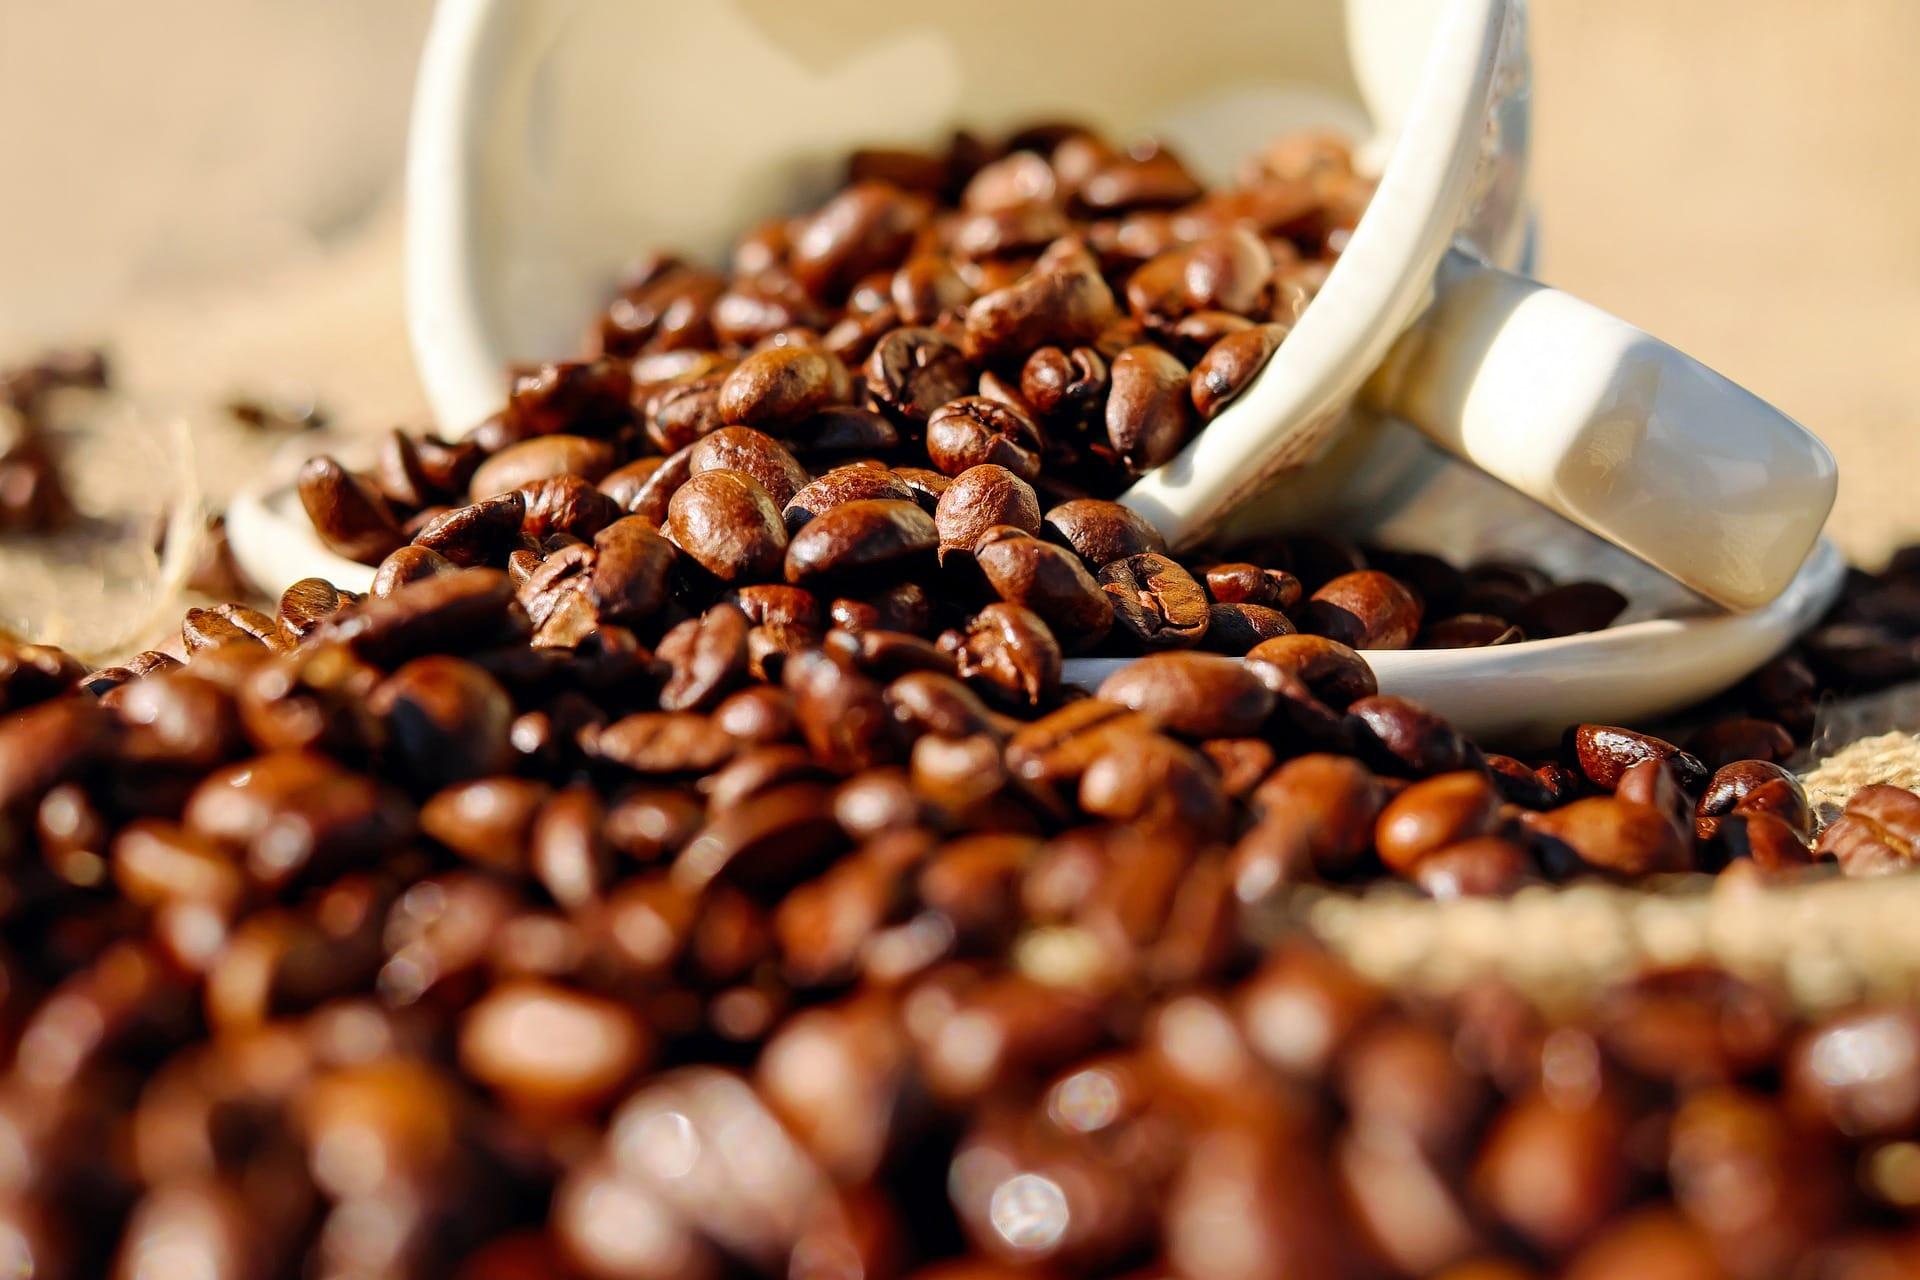 Decaf is NOT Caffeine-Free. antioxidant caffeine mug coffee beans skin care  beauty products